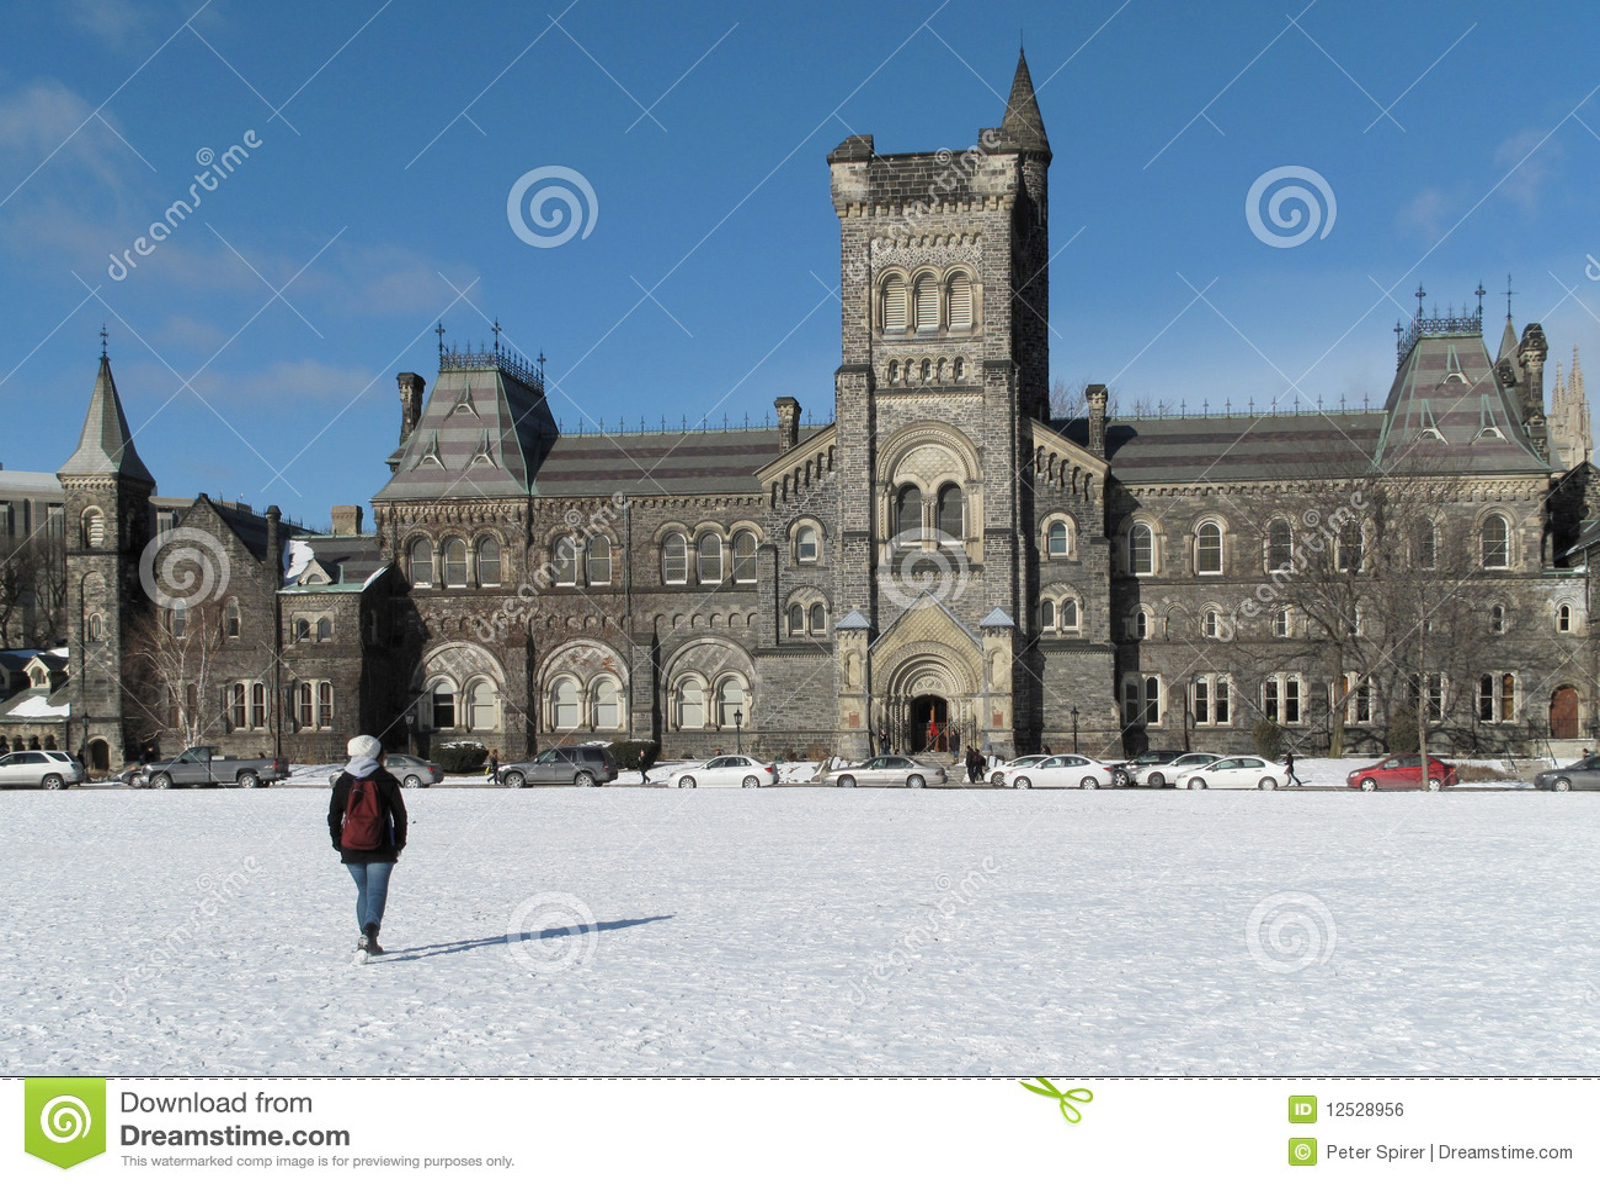 Universität im Winter